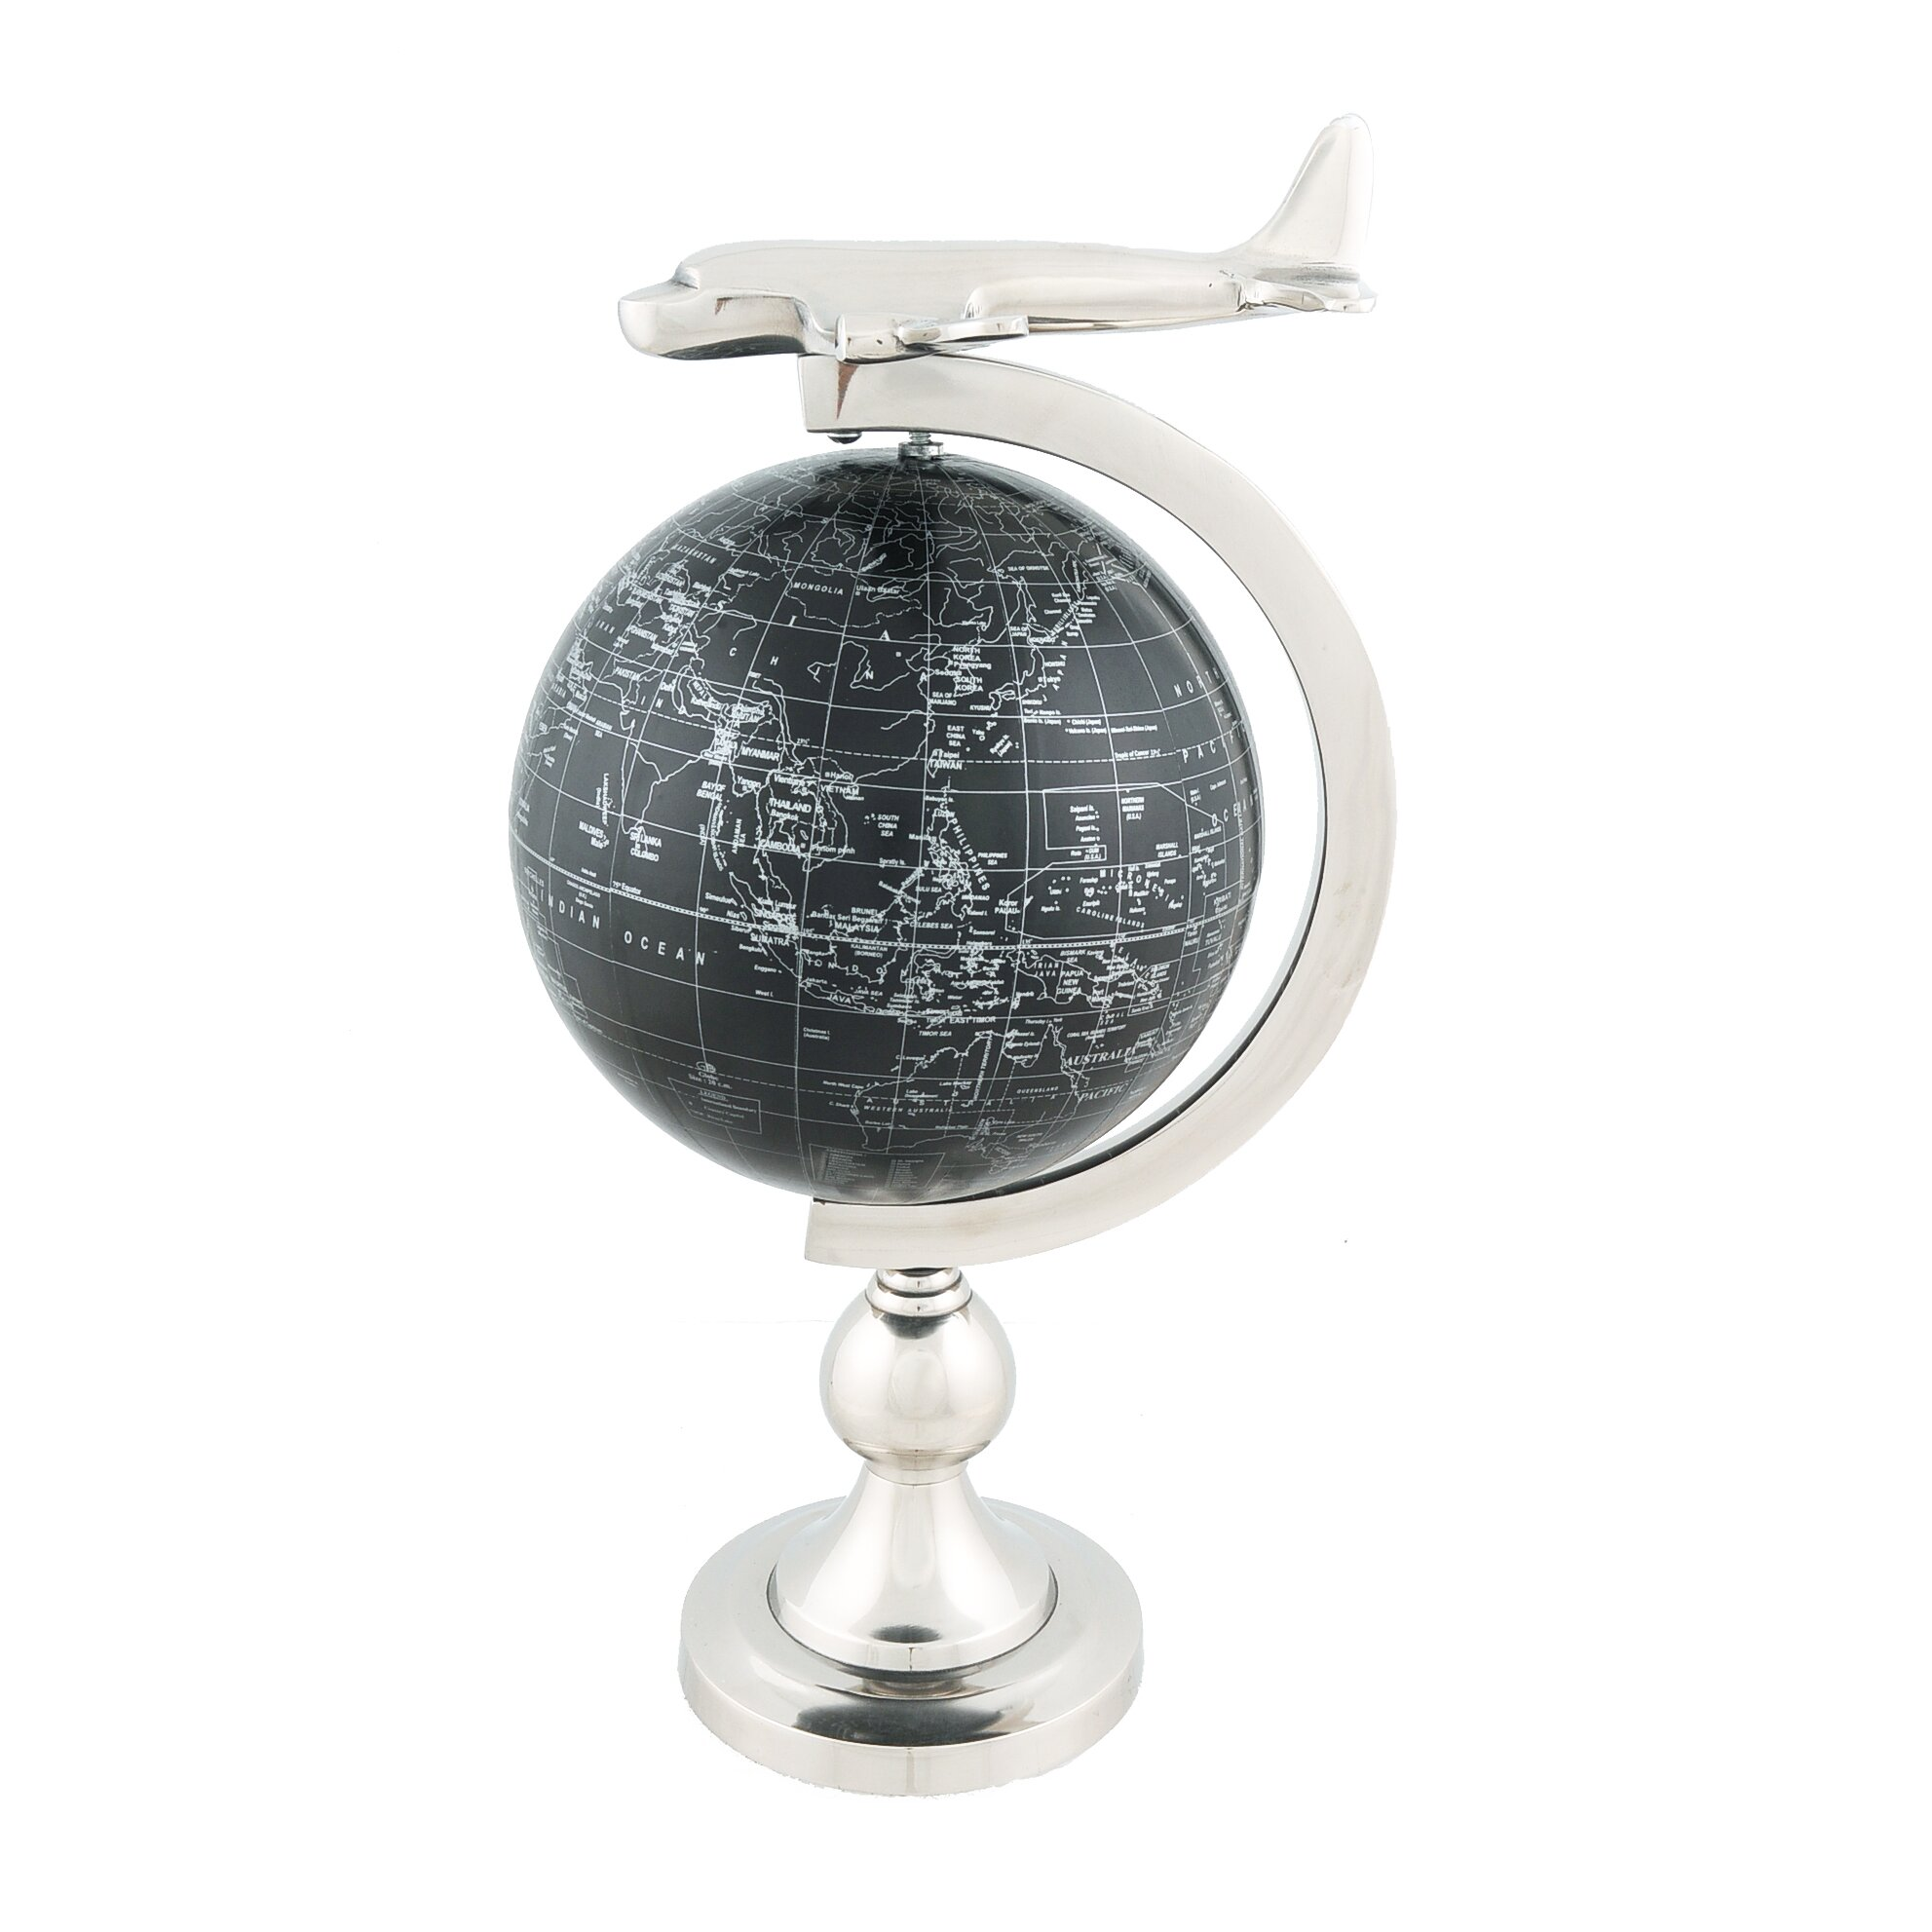 decorative airplane on globe with brass stand - Decorative Globe